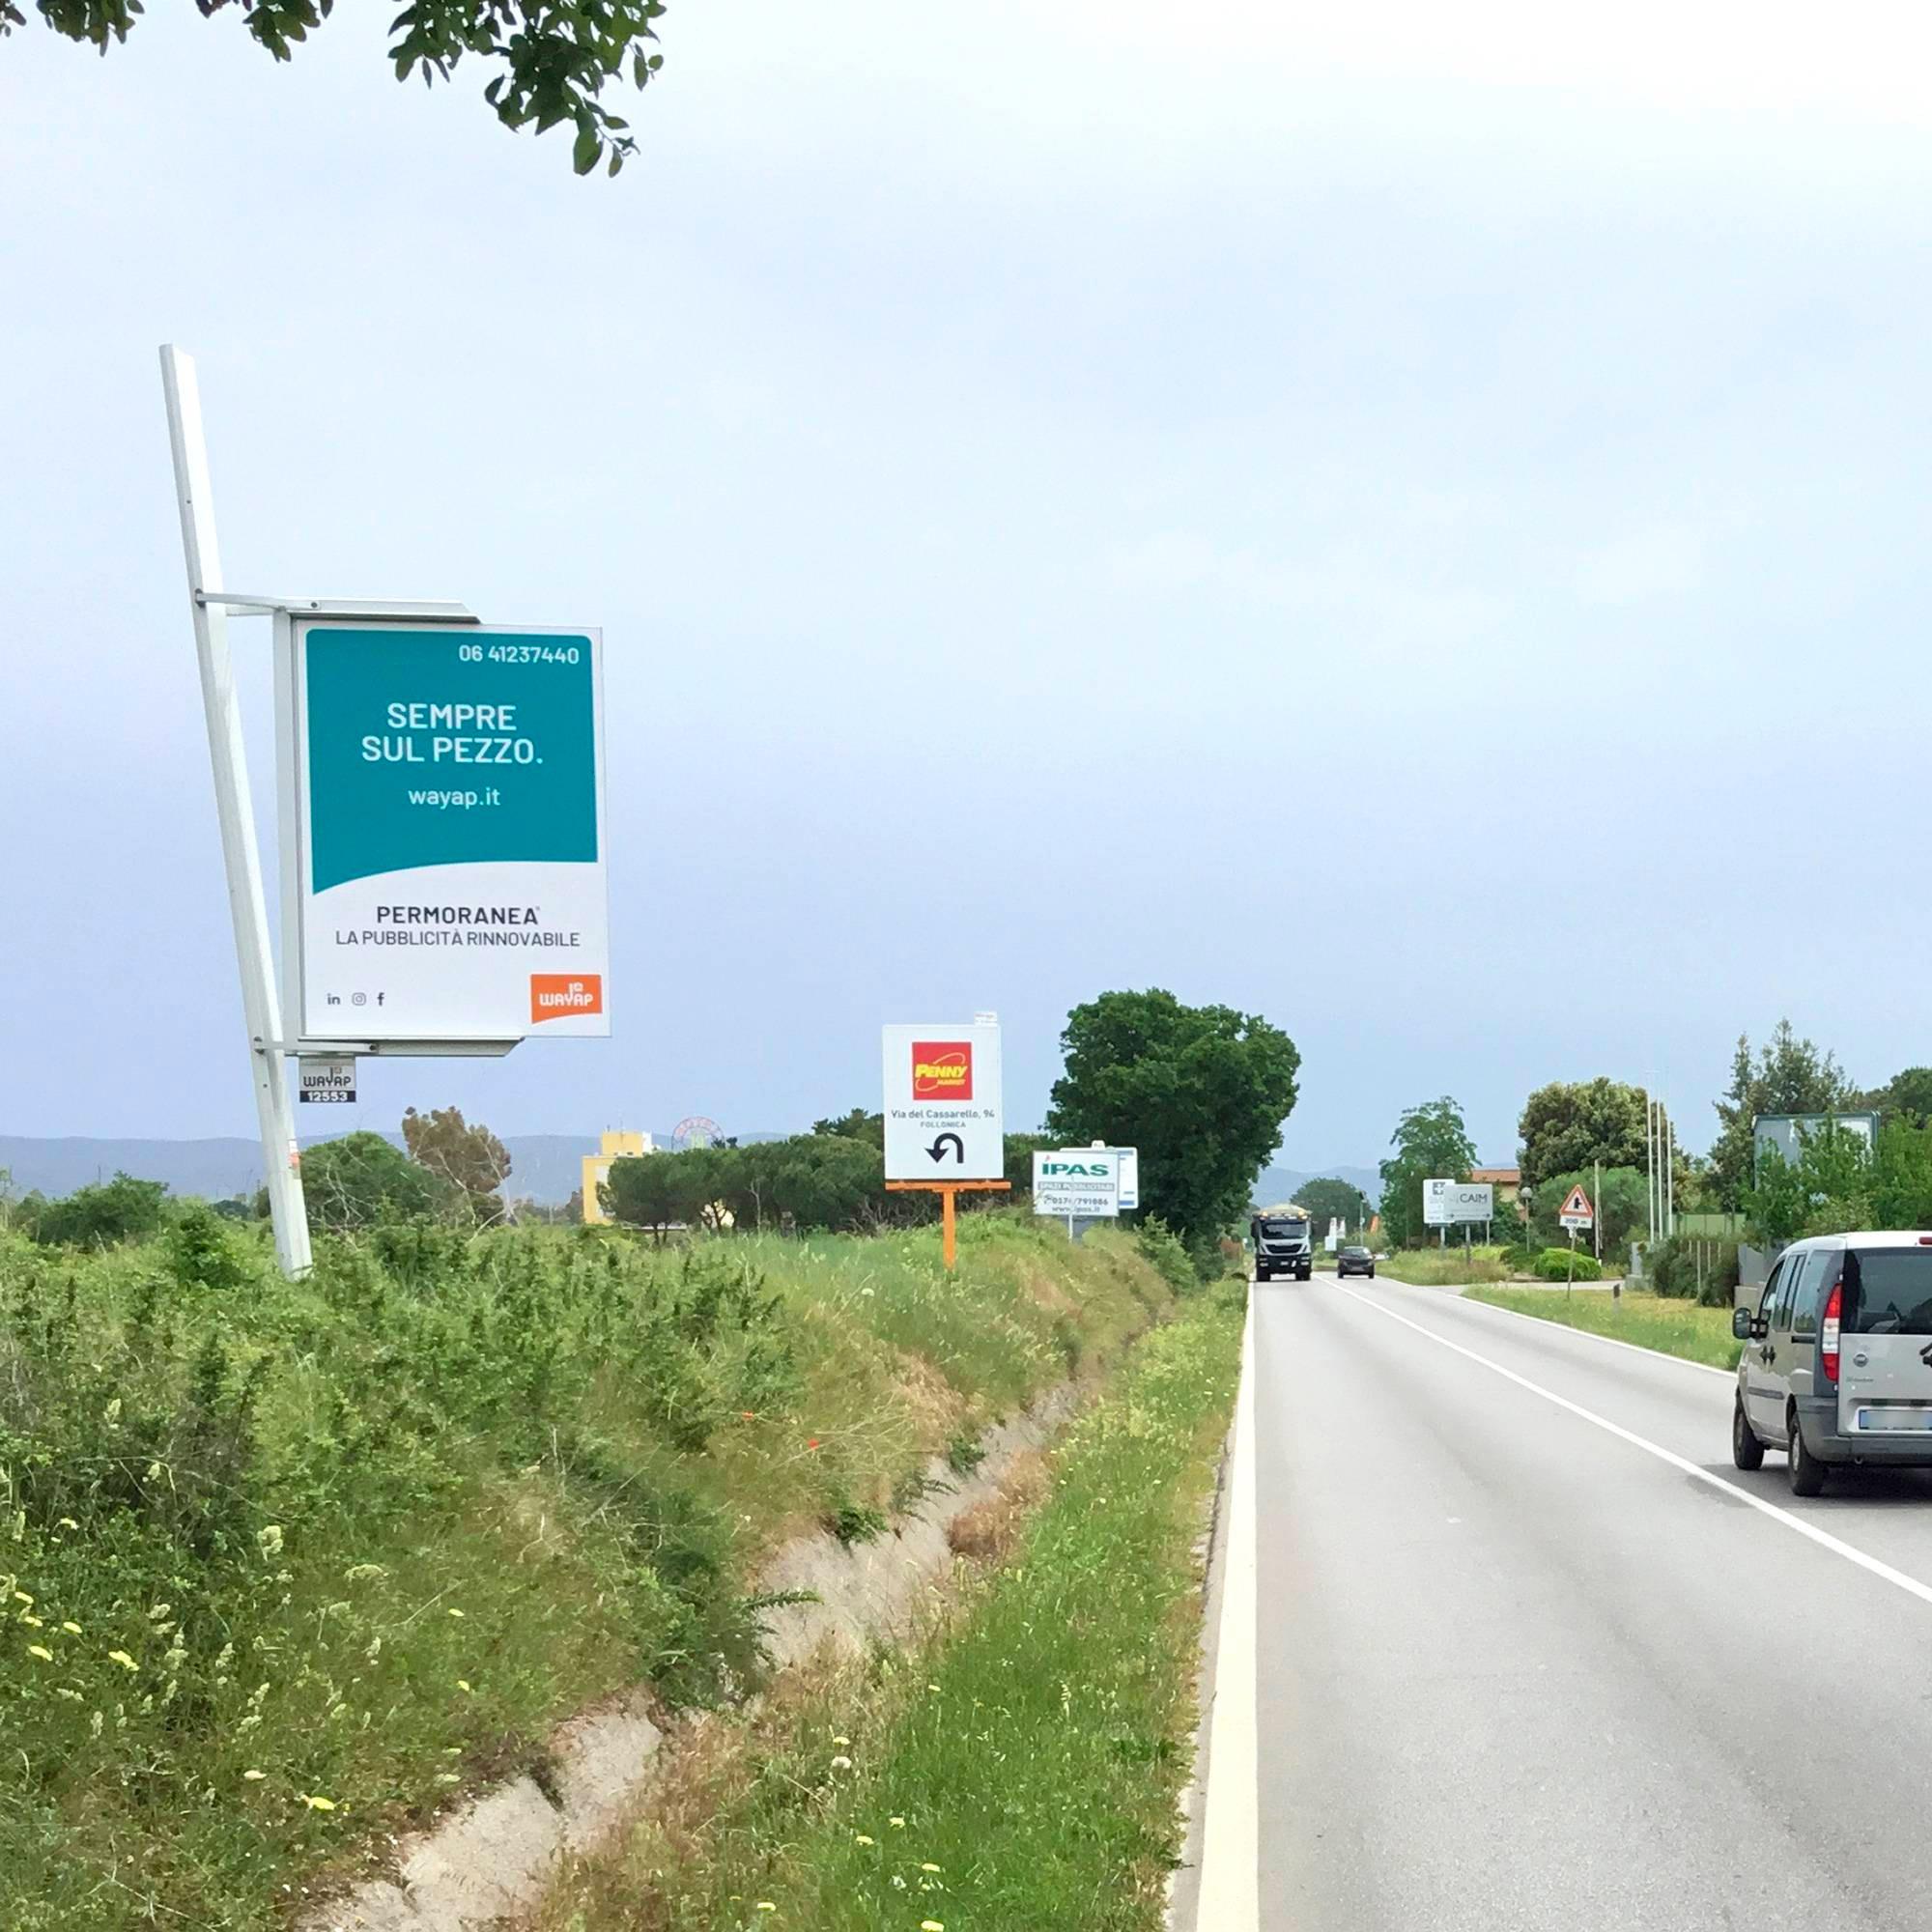 cartelli pubblicitari su strada di wayap | cartellonistica pubblicitaria per grandi aziende